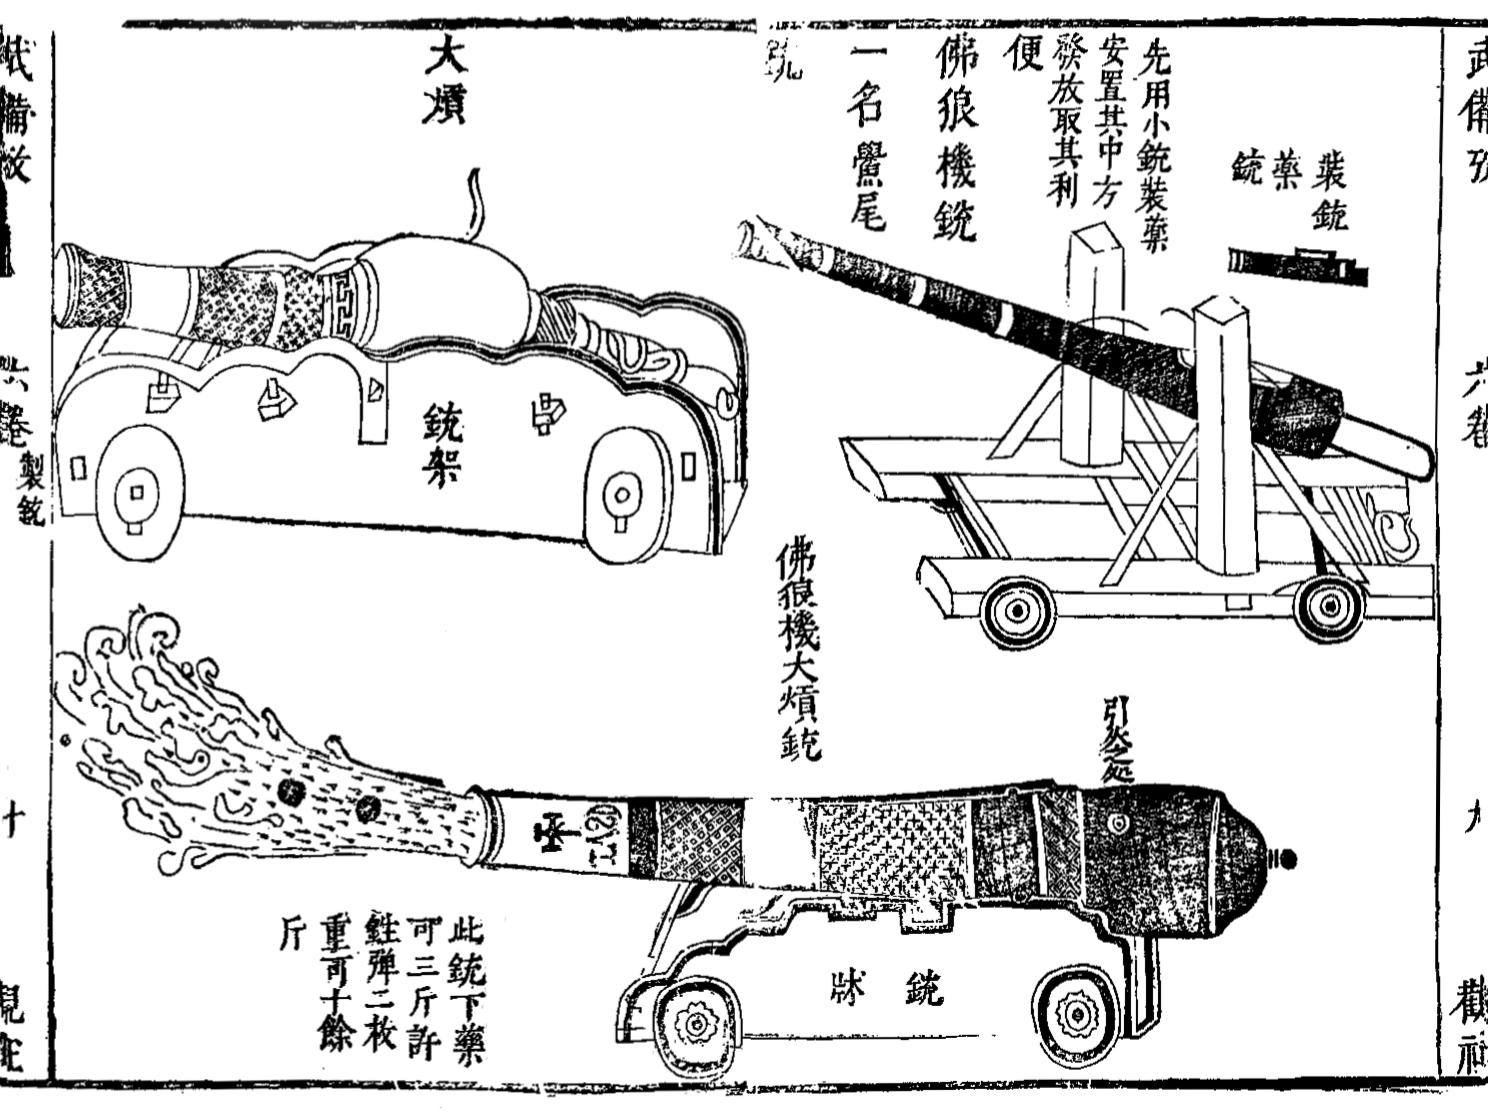 Hong Yi Pao And Xi Yang Pao